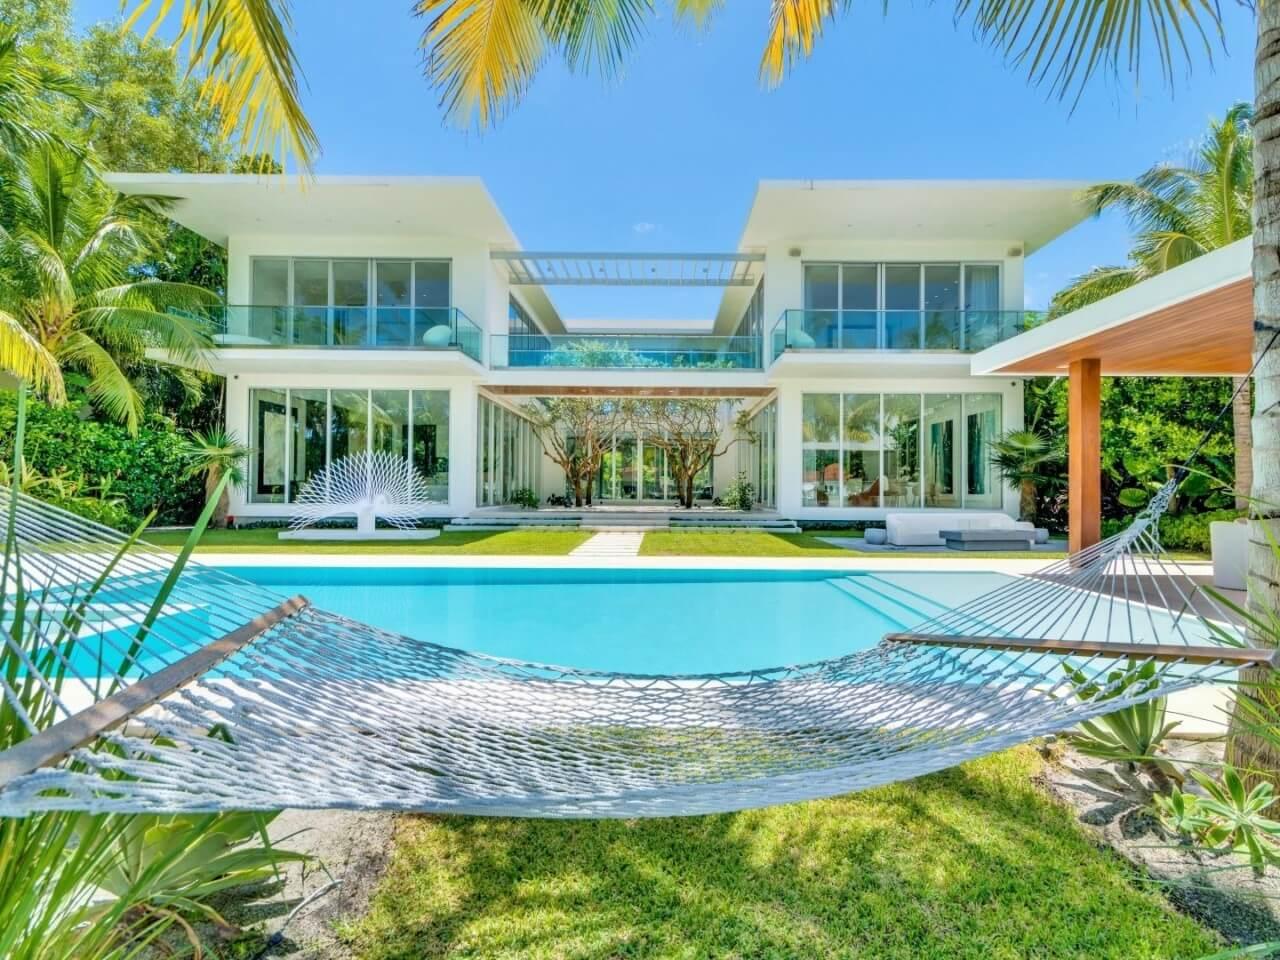 Buy Homes In Miami Beach Fl